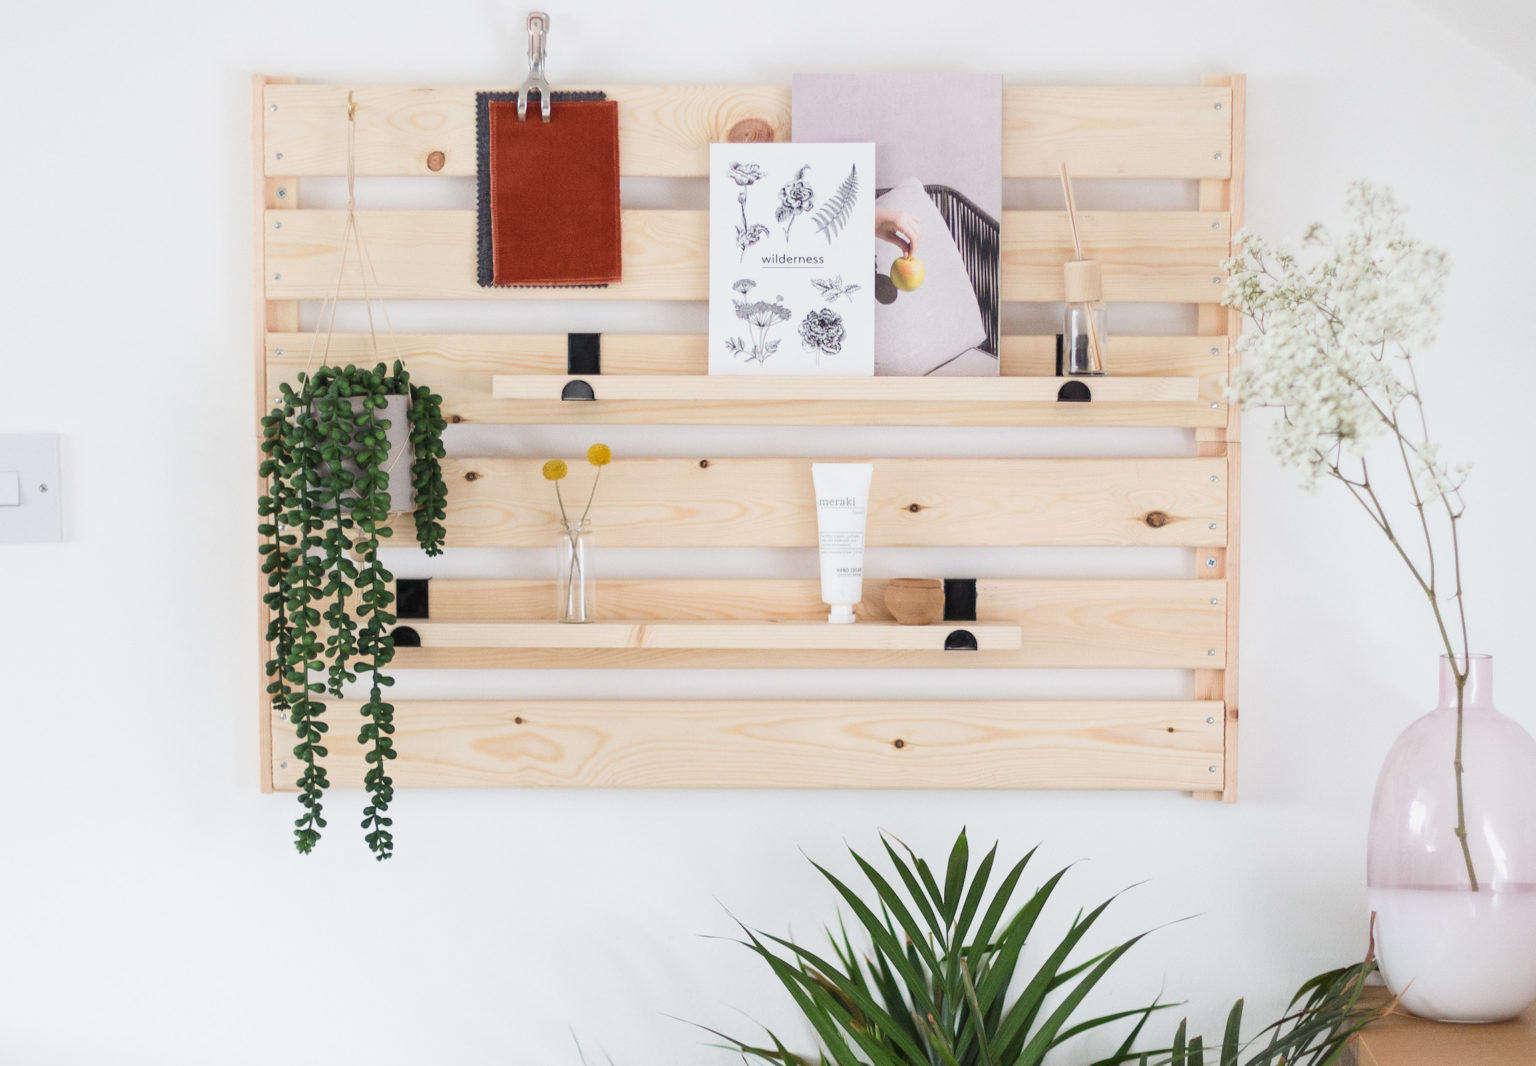 DIY Ikea Hack: A Genius Wall-Mounted Wooden Organizer